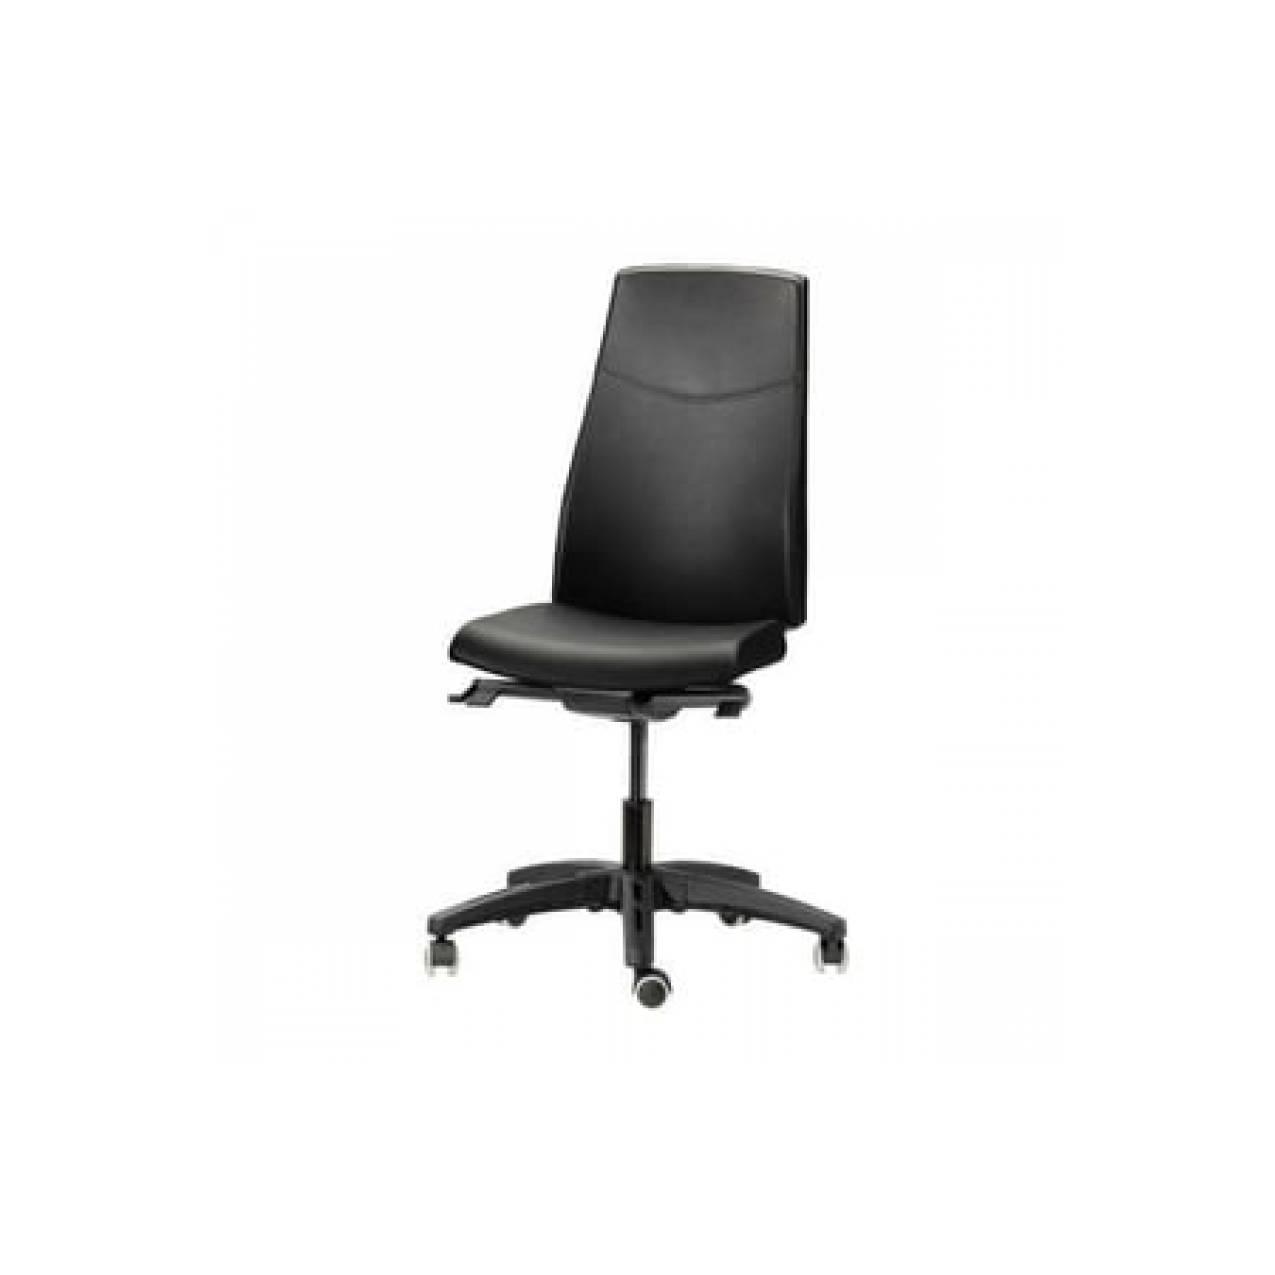 IKEA VOLMAR Kursi Kerja Putar / Direktur - Mjuk hitam